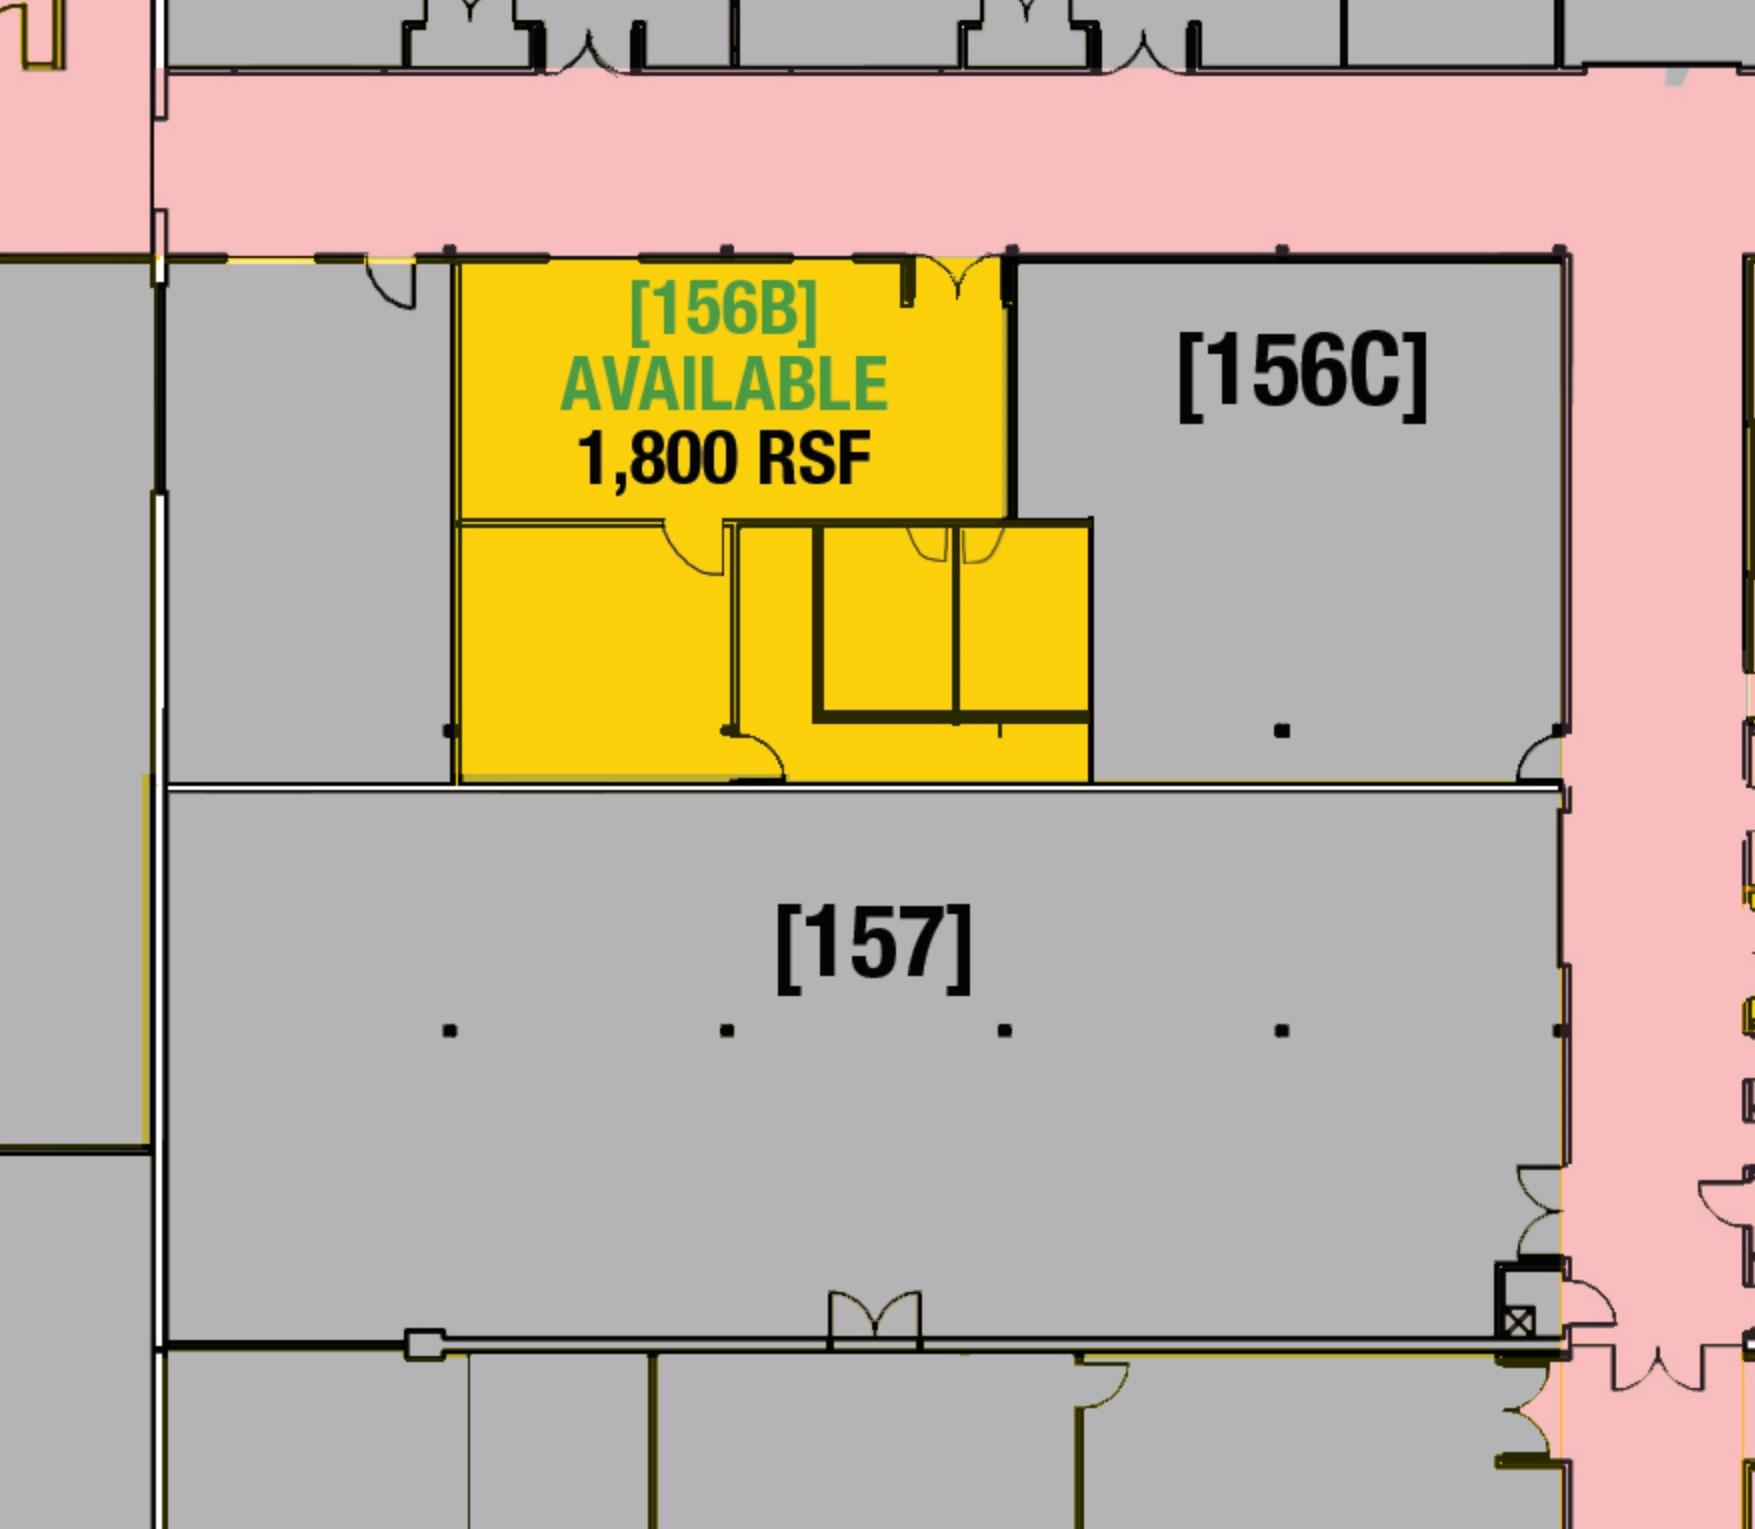 SUITE 136 – 3,479 RSF